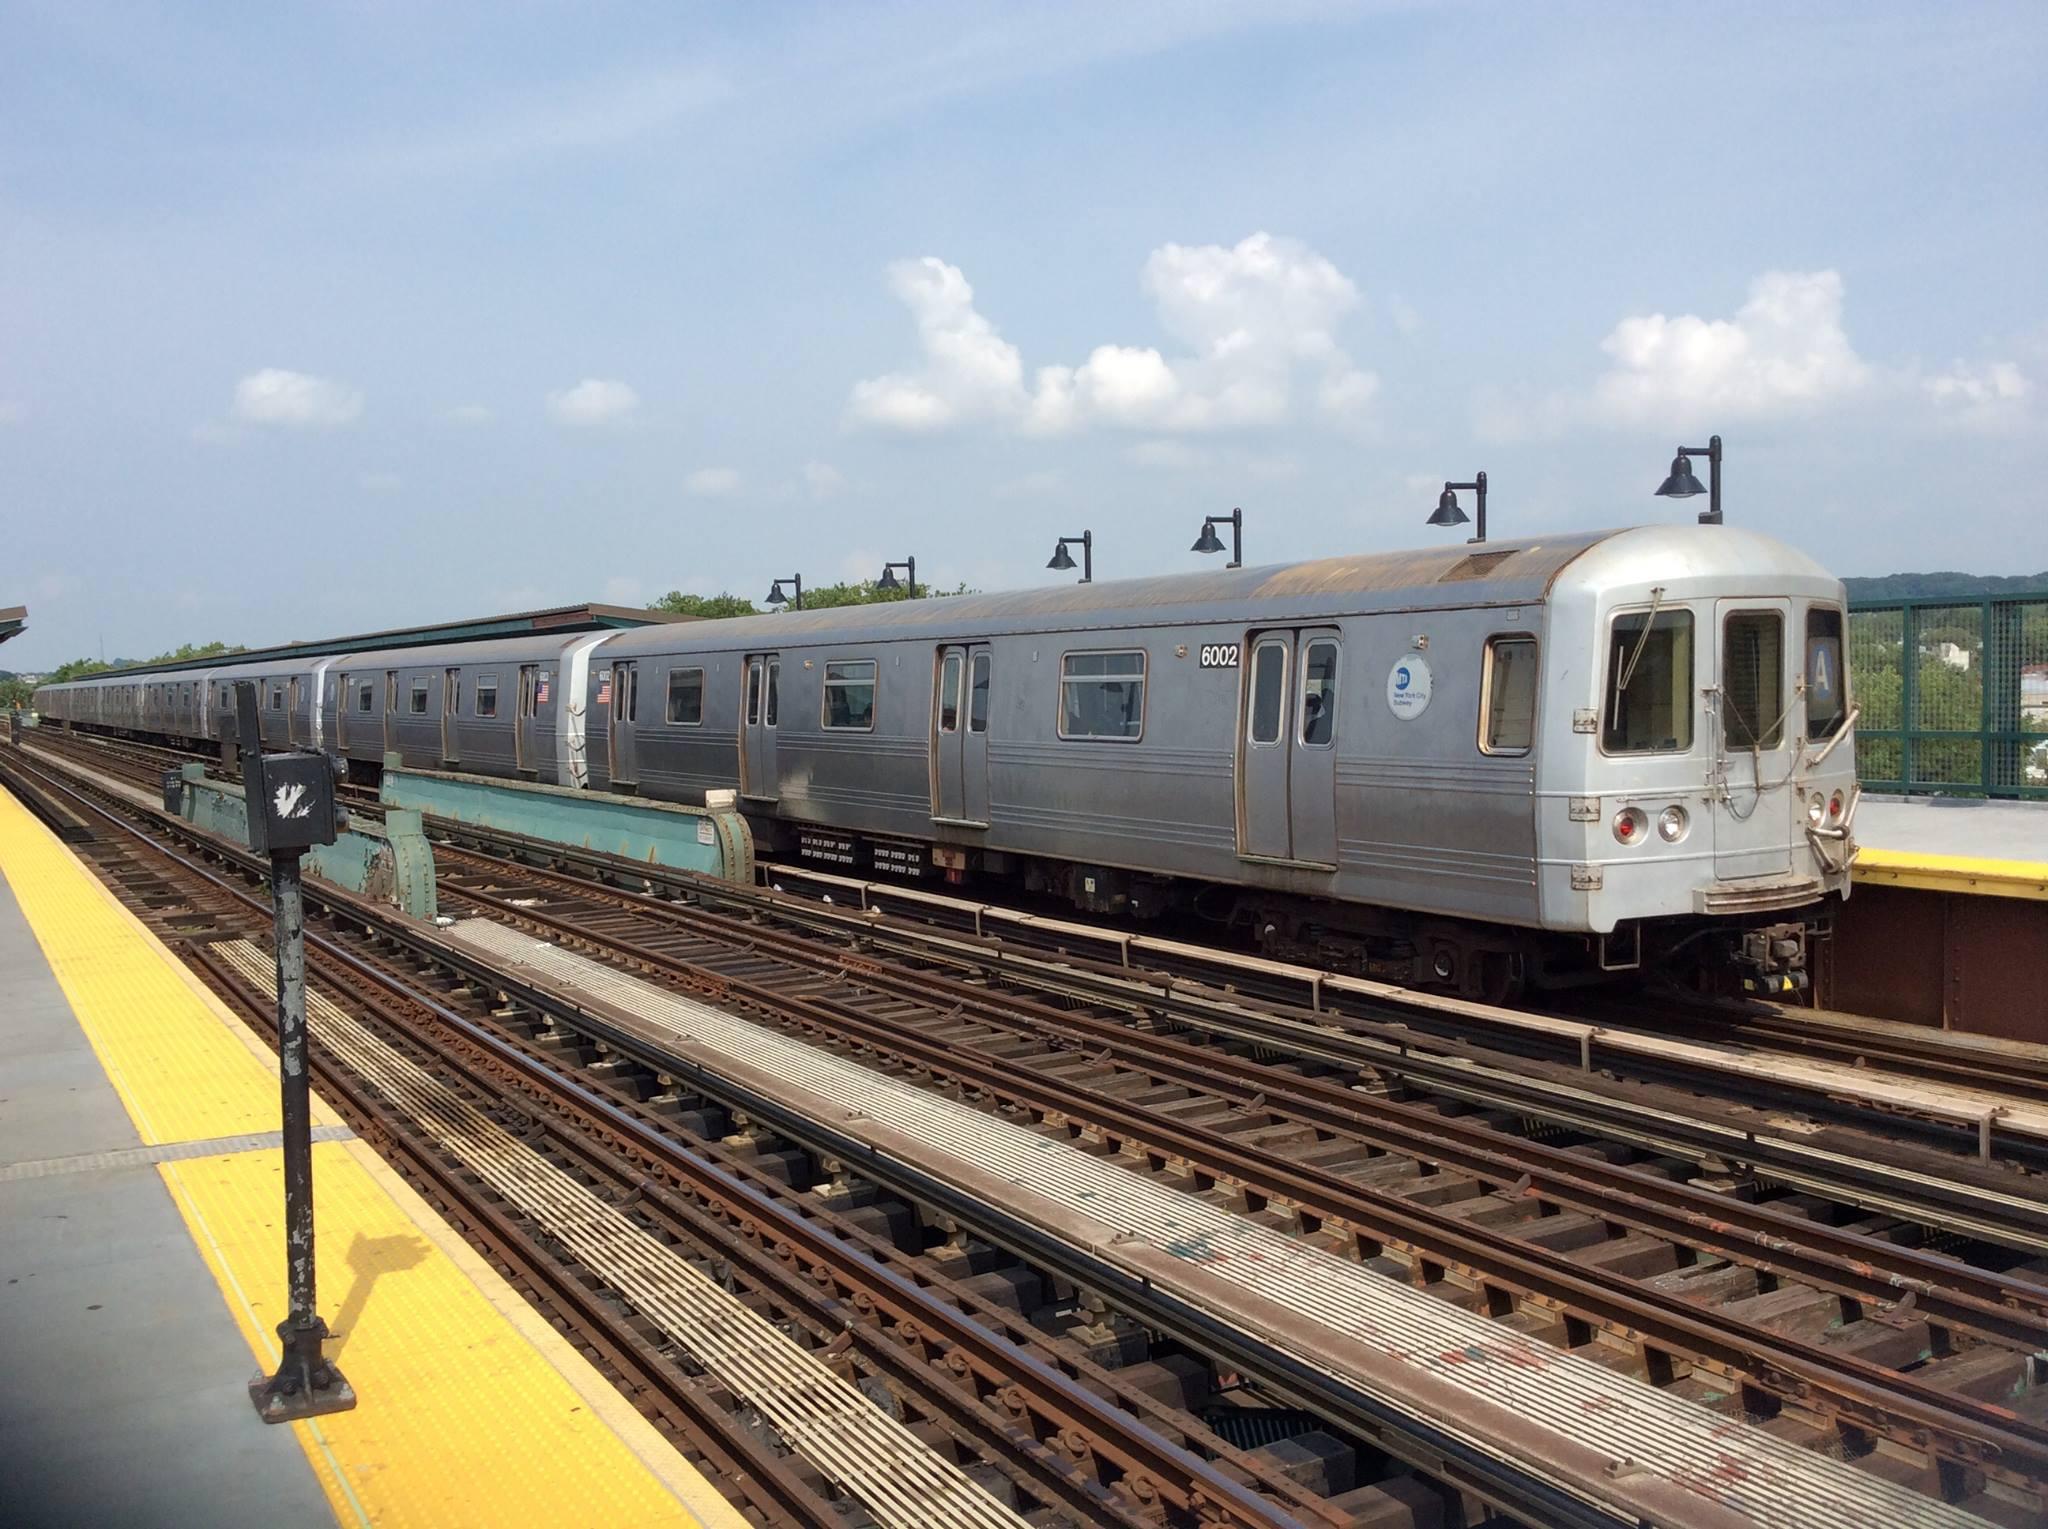 A New York City Subway Service Wikipedia - Nyc subway map j train